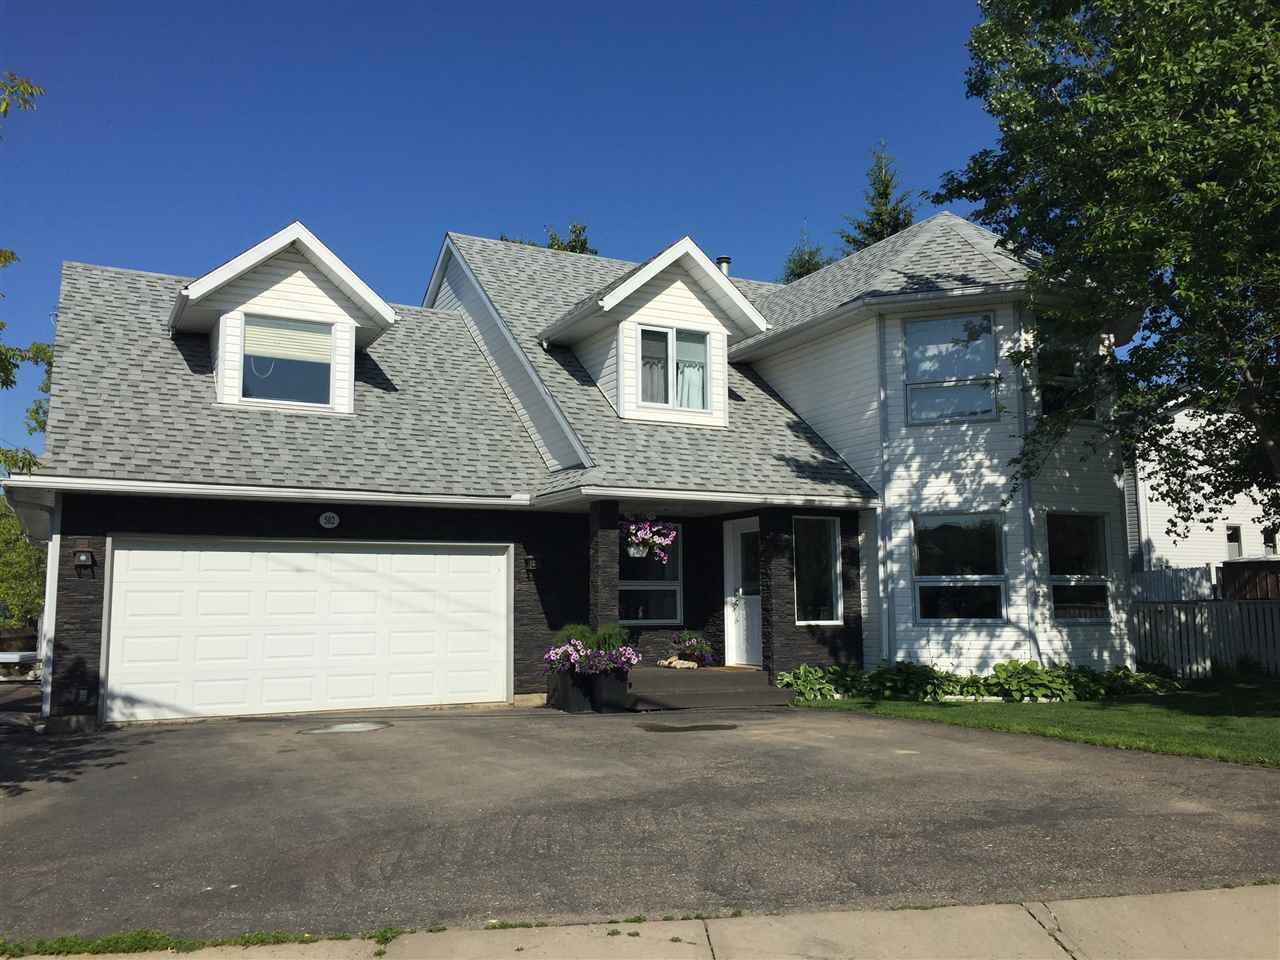 Main Photo: 502 16 Street: Cold Lake House for sale : MLS®# E4144275